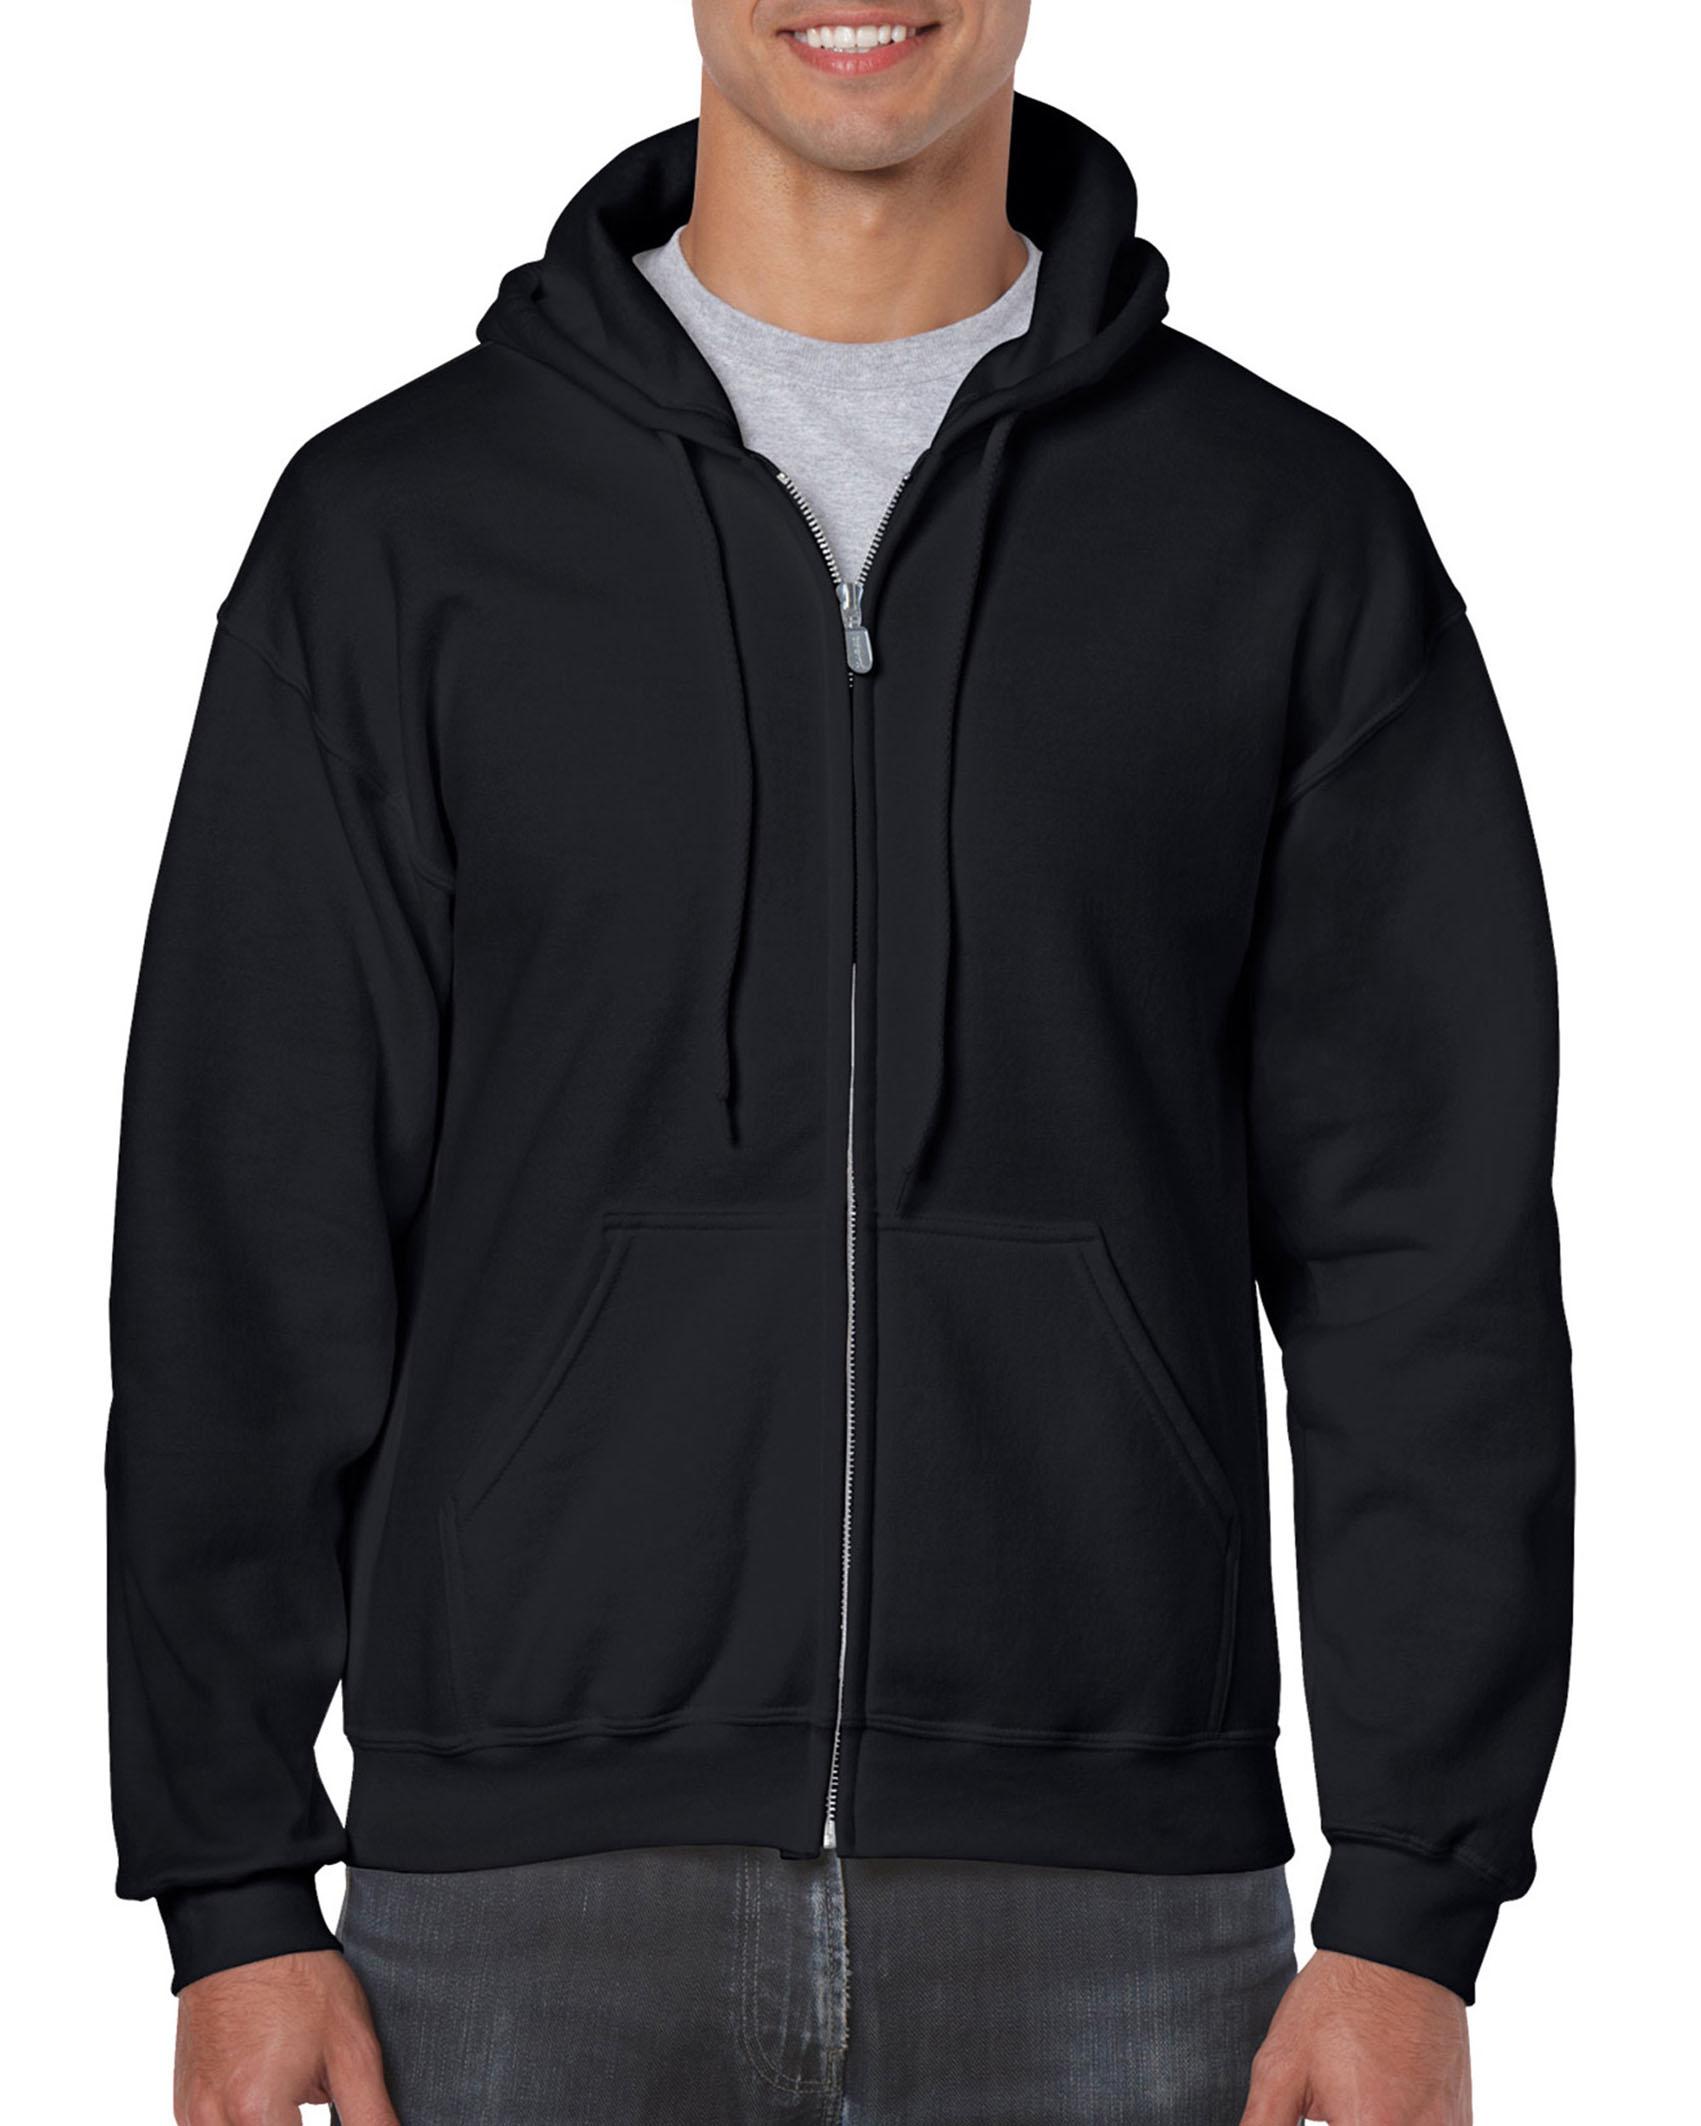 25St Gildan Hoodie Full Zip incl. 1k opdruk (Black)